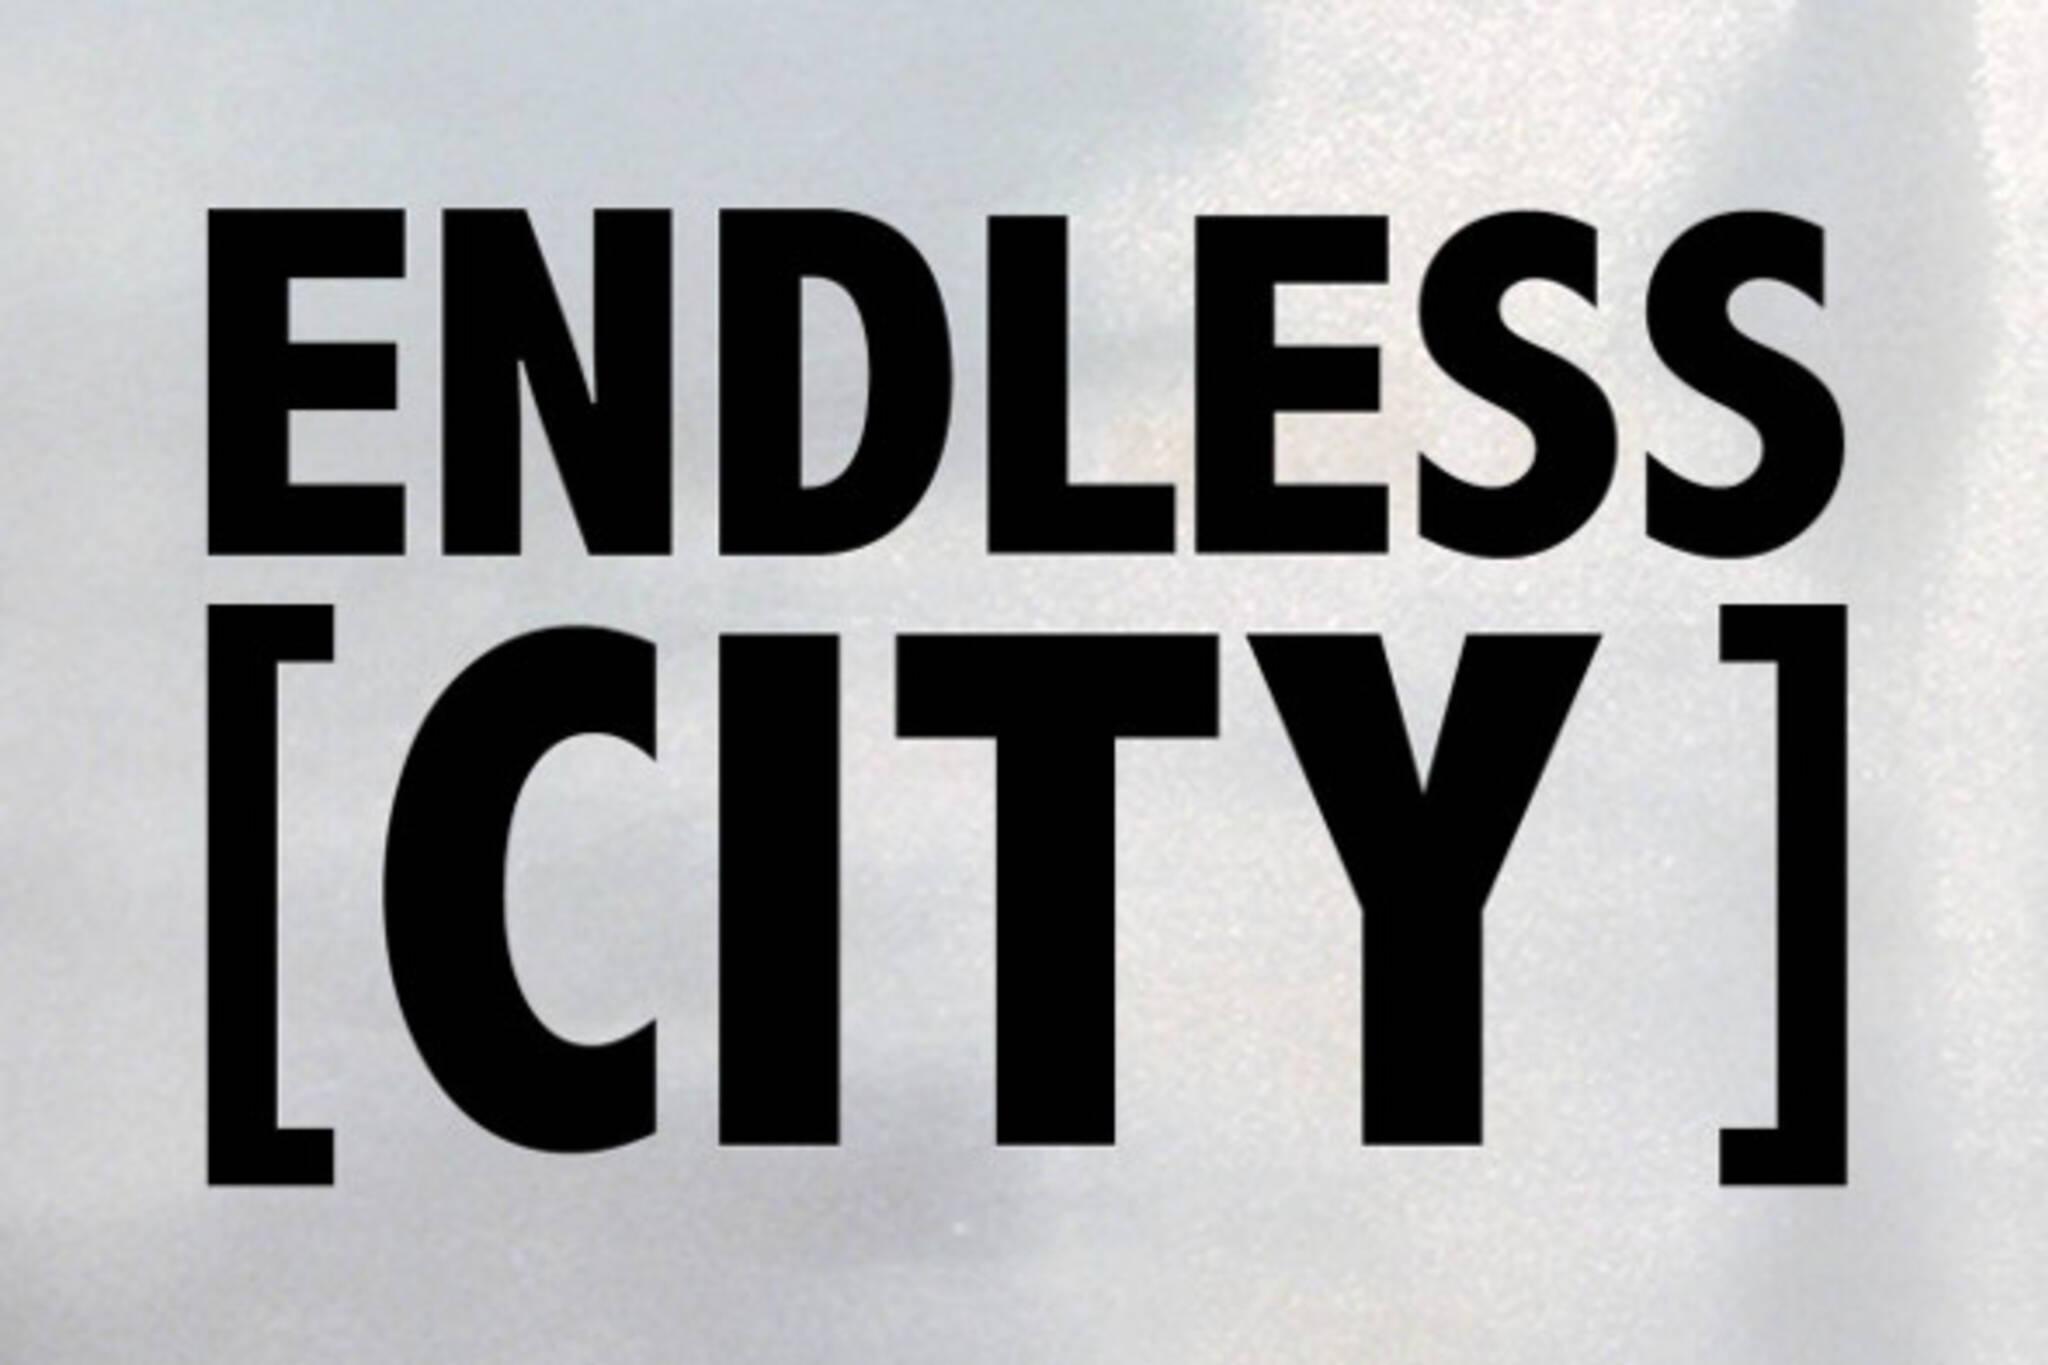 Endless City Toronto